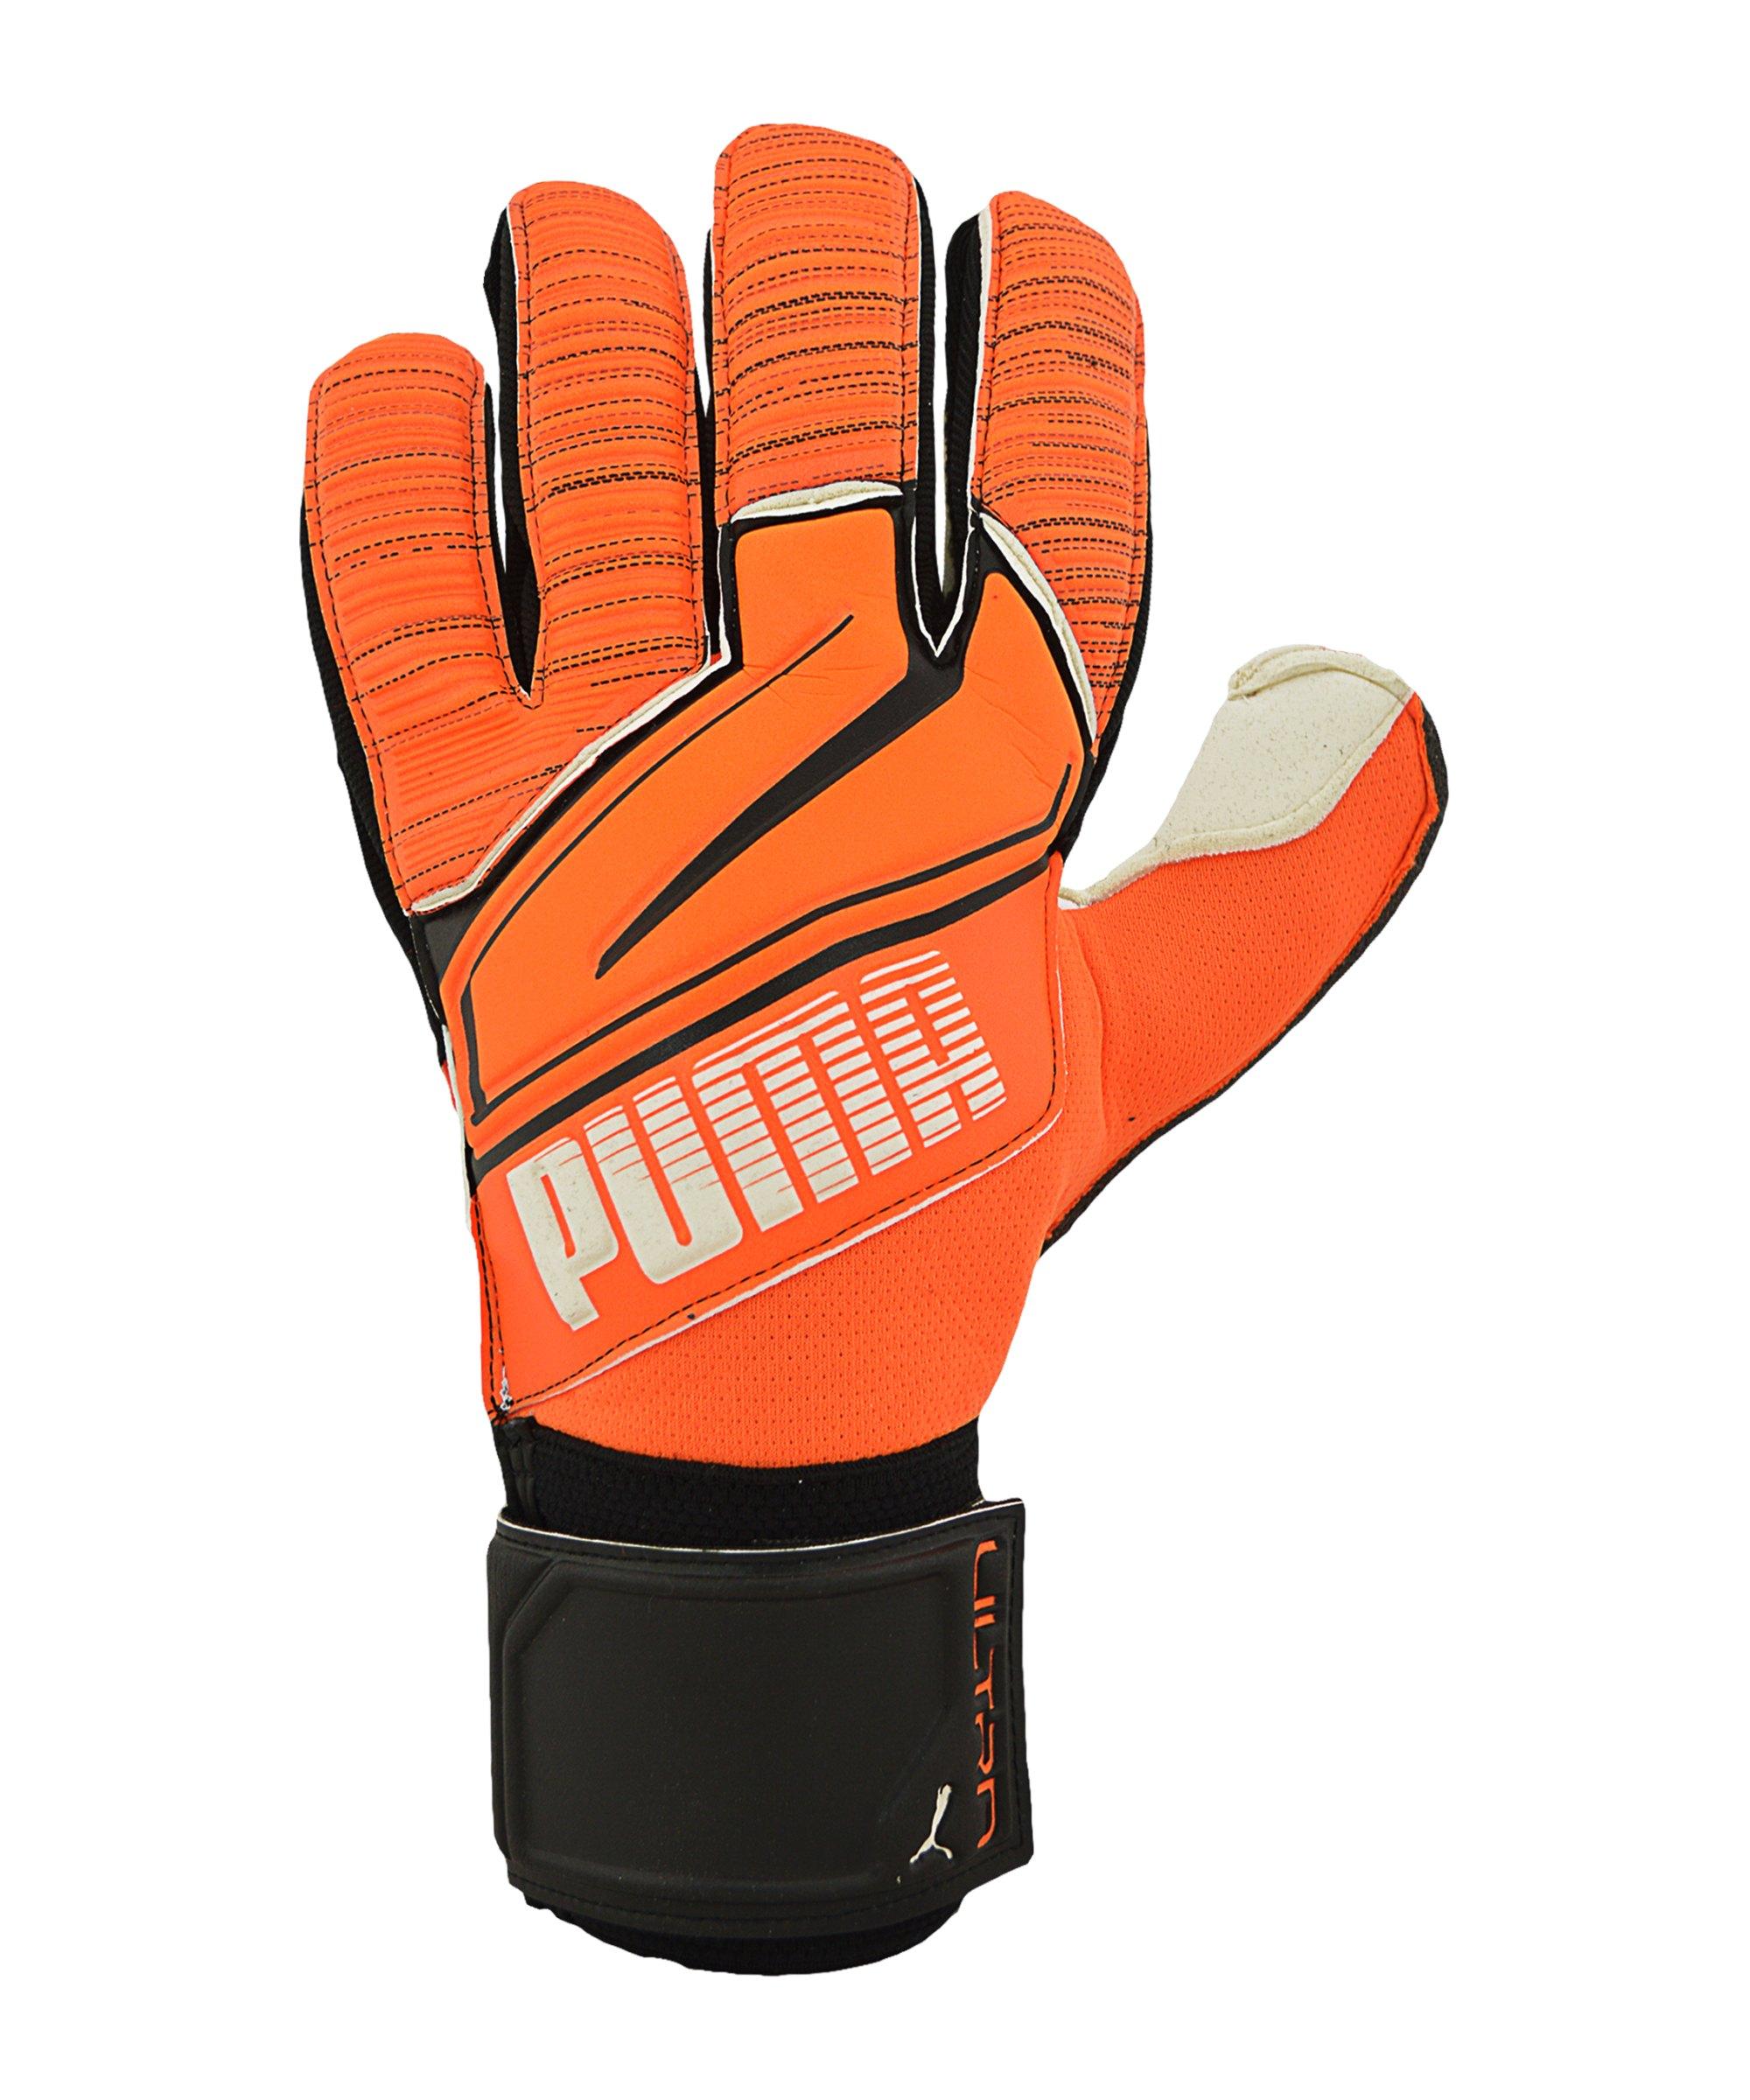 PUMA ULTRA Grip 1 RC Torwarthandschuh Orange F01 - orange